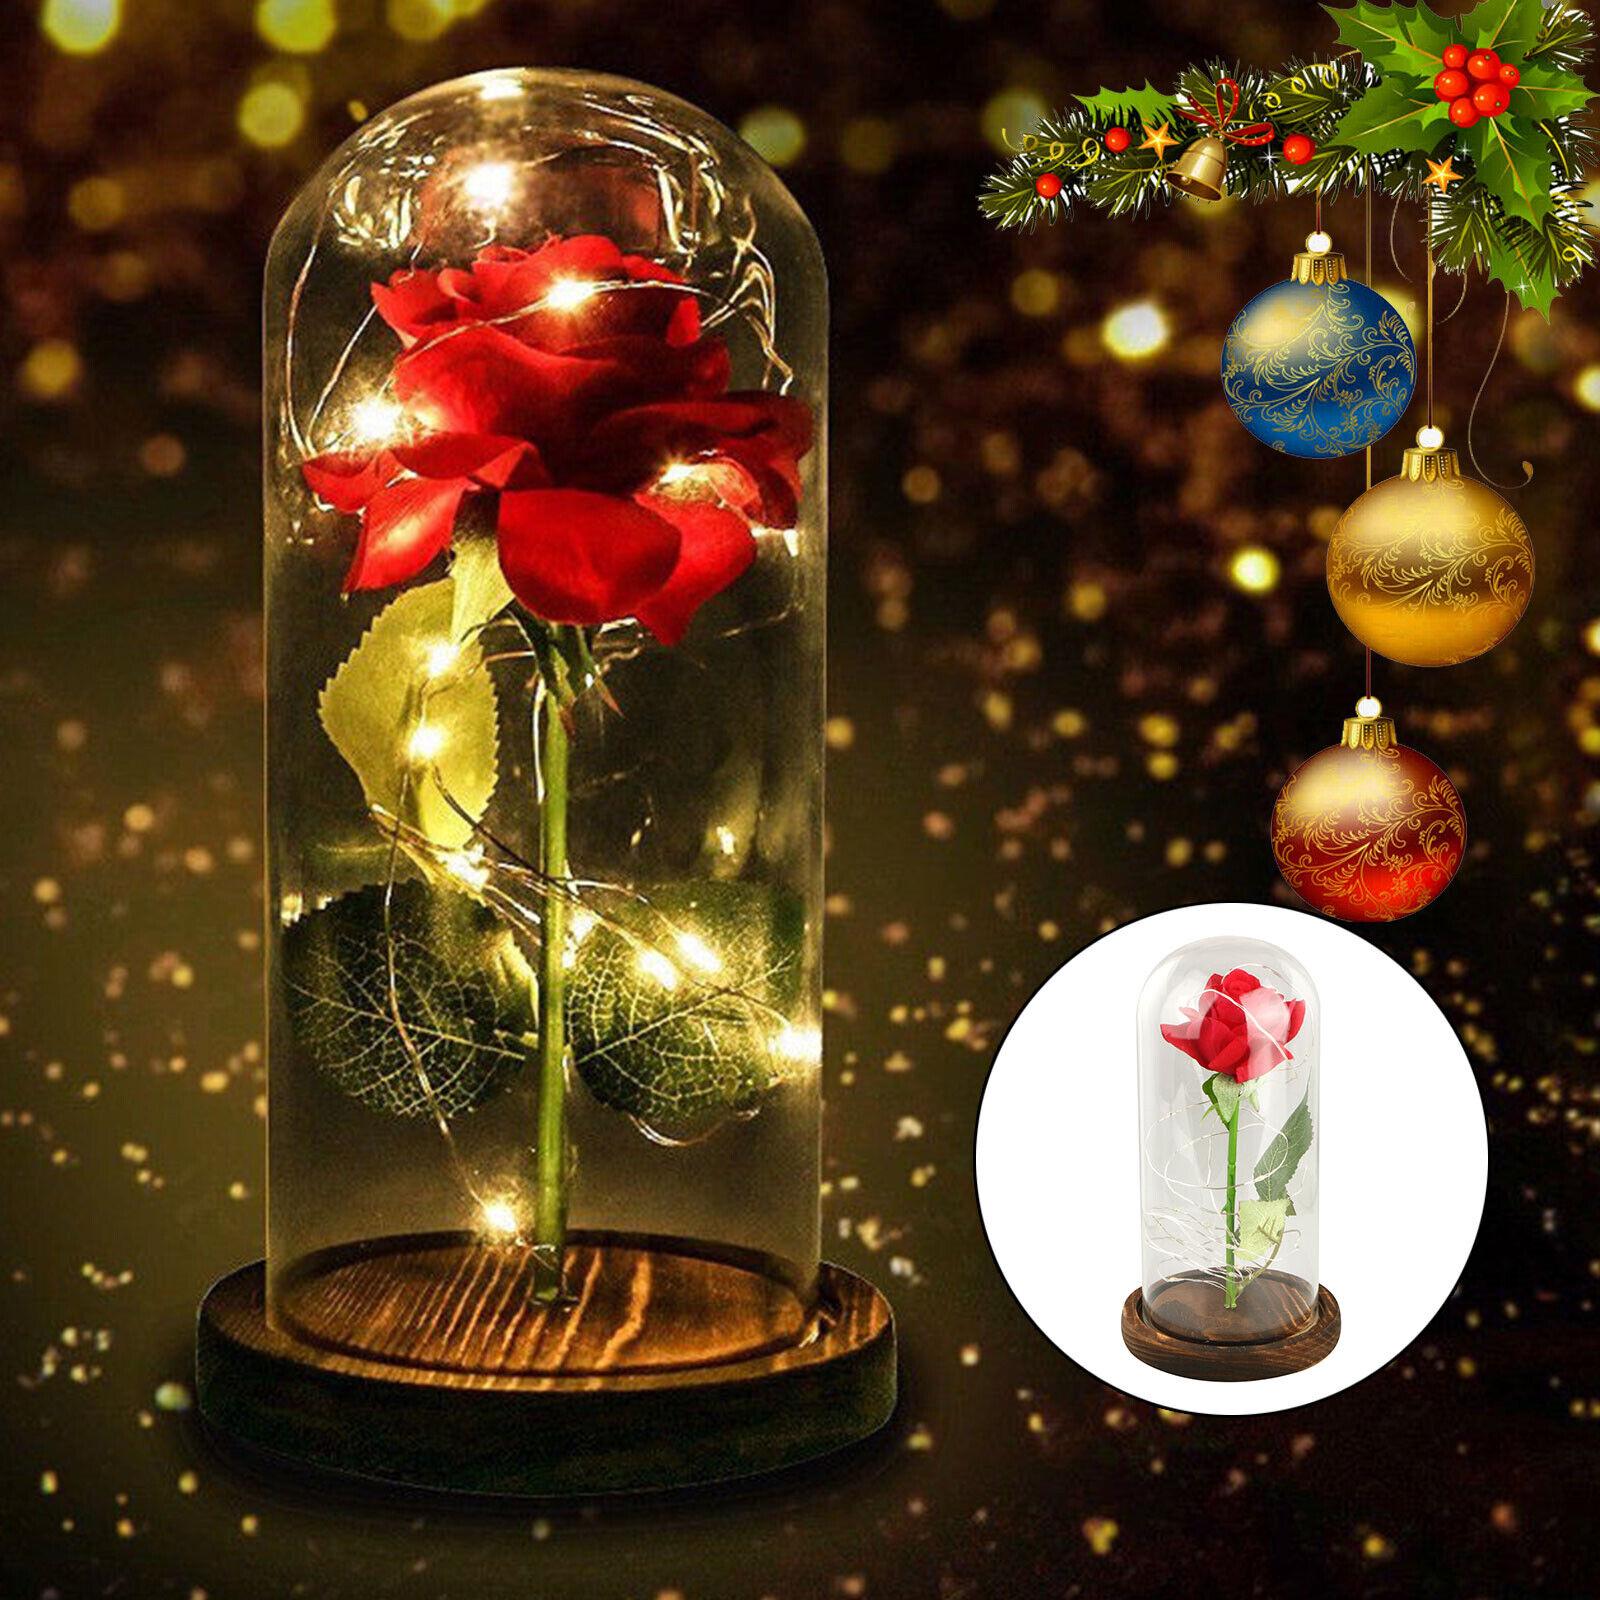 Rose Night Light in Enchanted Rose Elegant Glass Dome Pine Base Surprise Gift